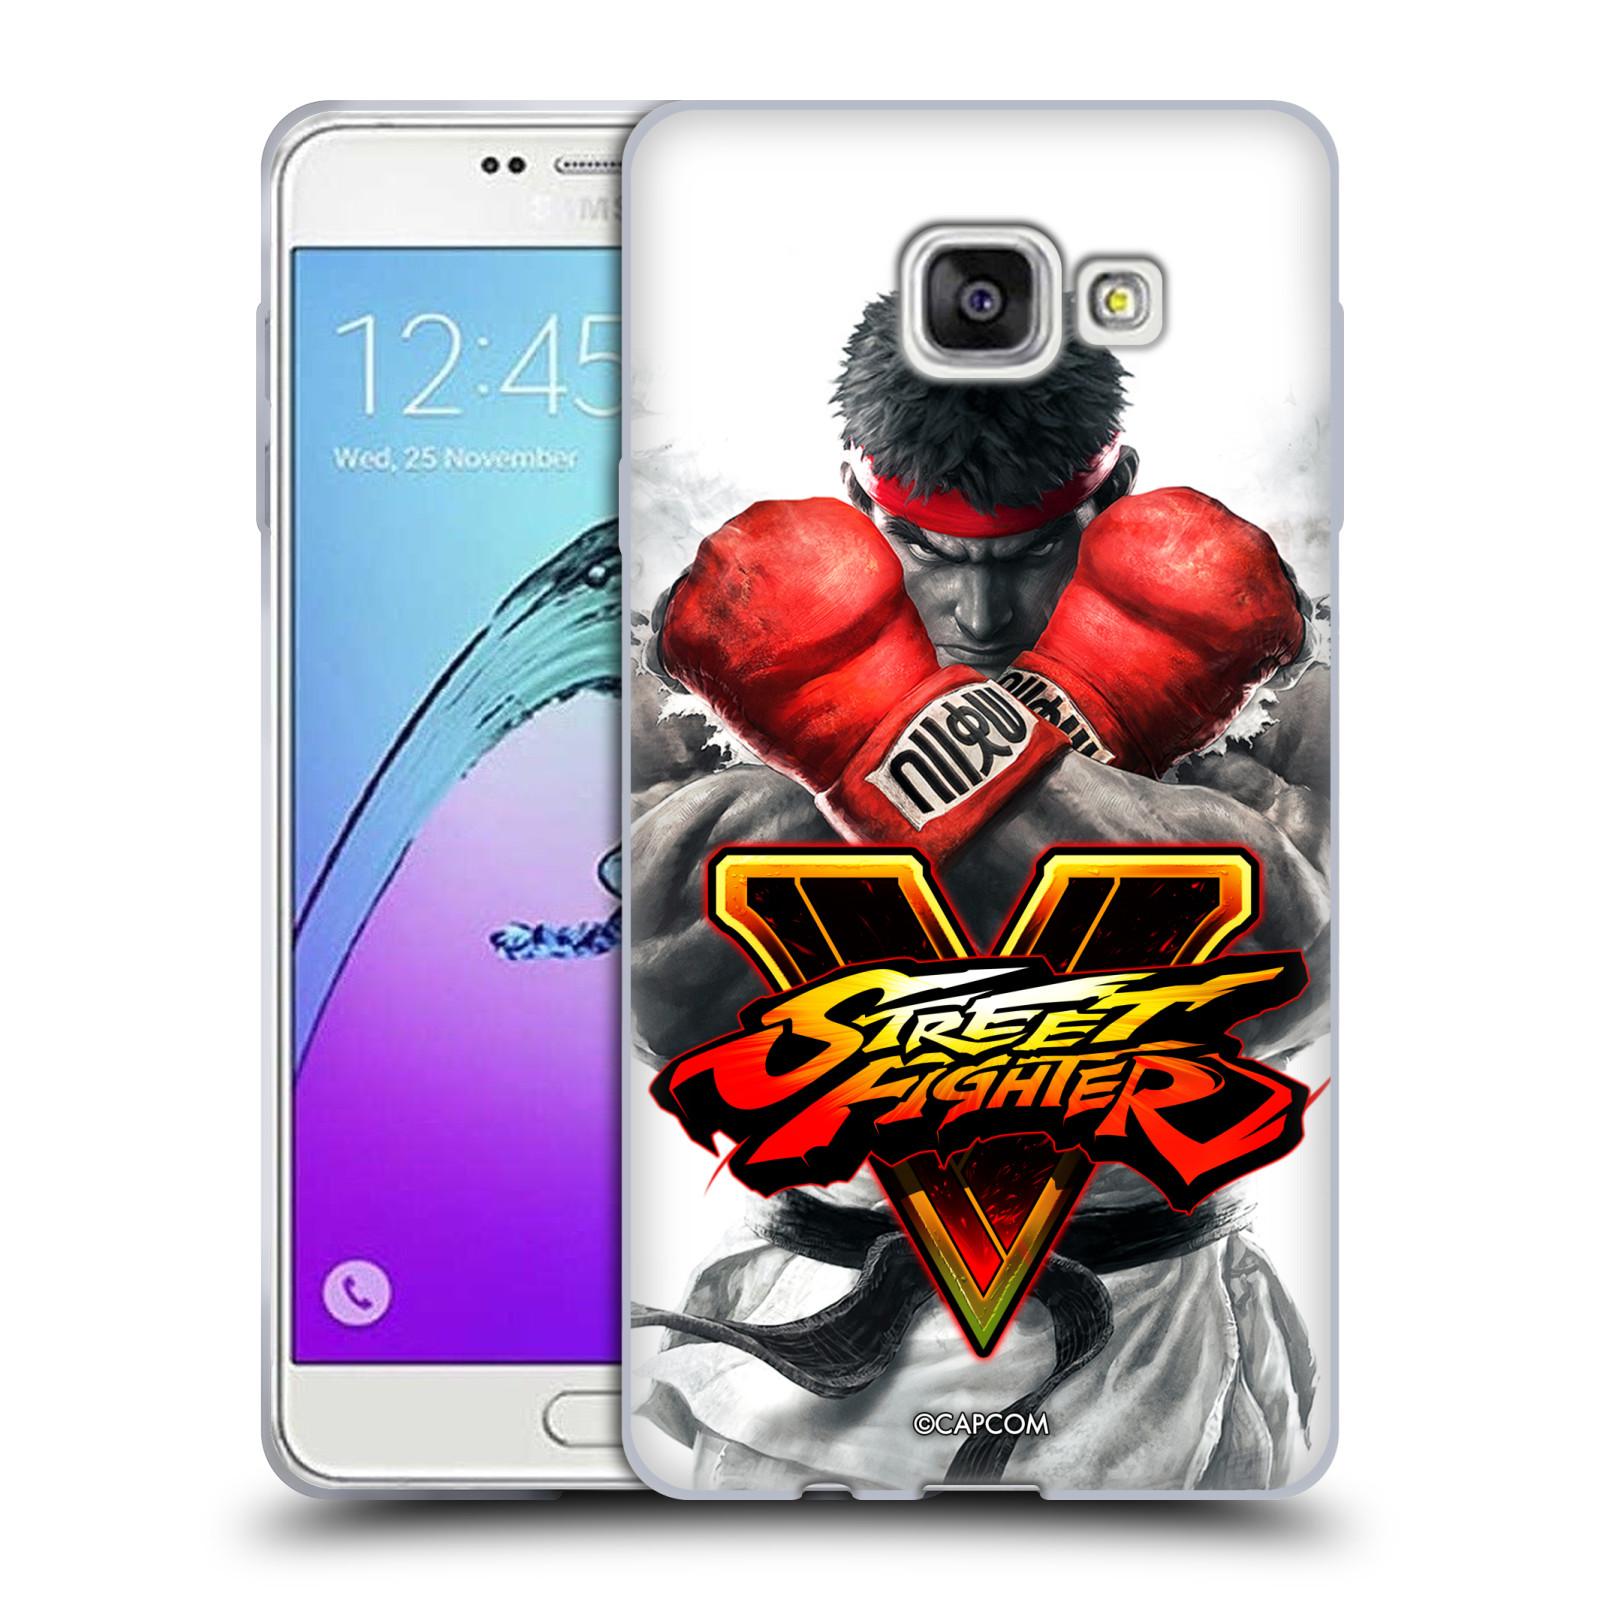 HEAD CASE silikonový obal na mobil Samsung Galaxy A7 2017 (A720) oficiální kryt STREET FIGHTER Boxer Ryu